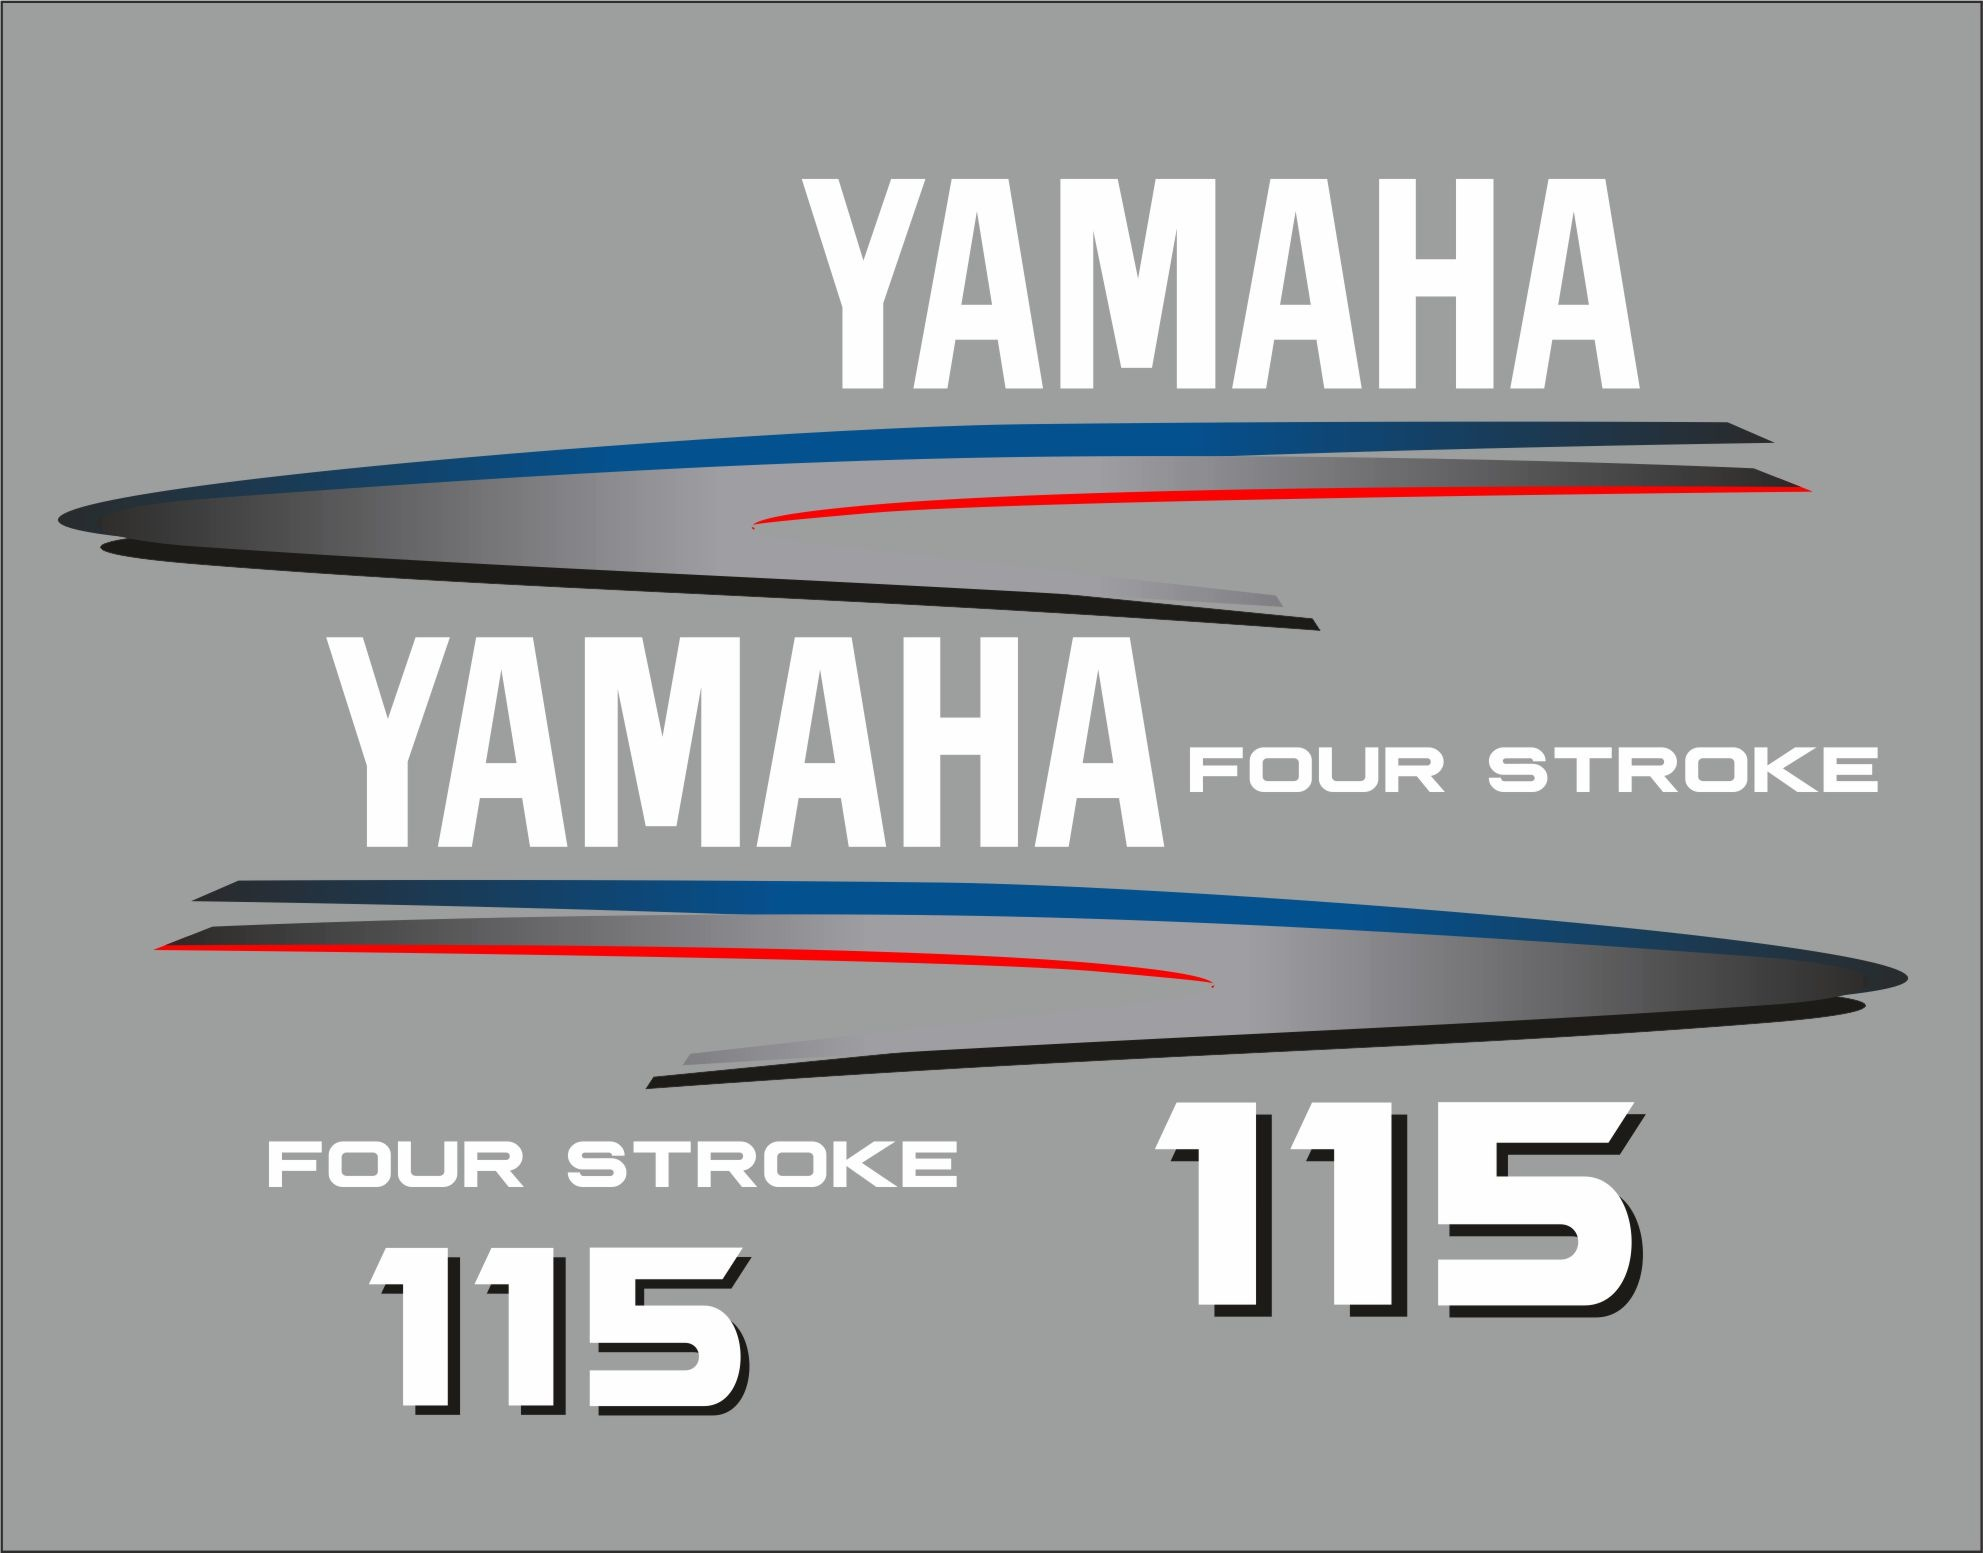 Yamaha buitenboordmotor 115 pk 4-takt sticker set